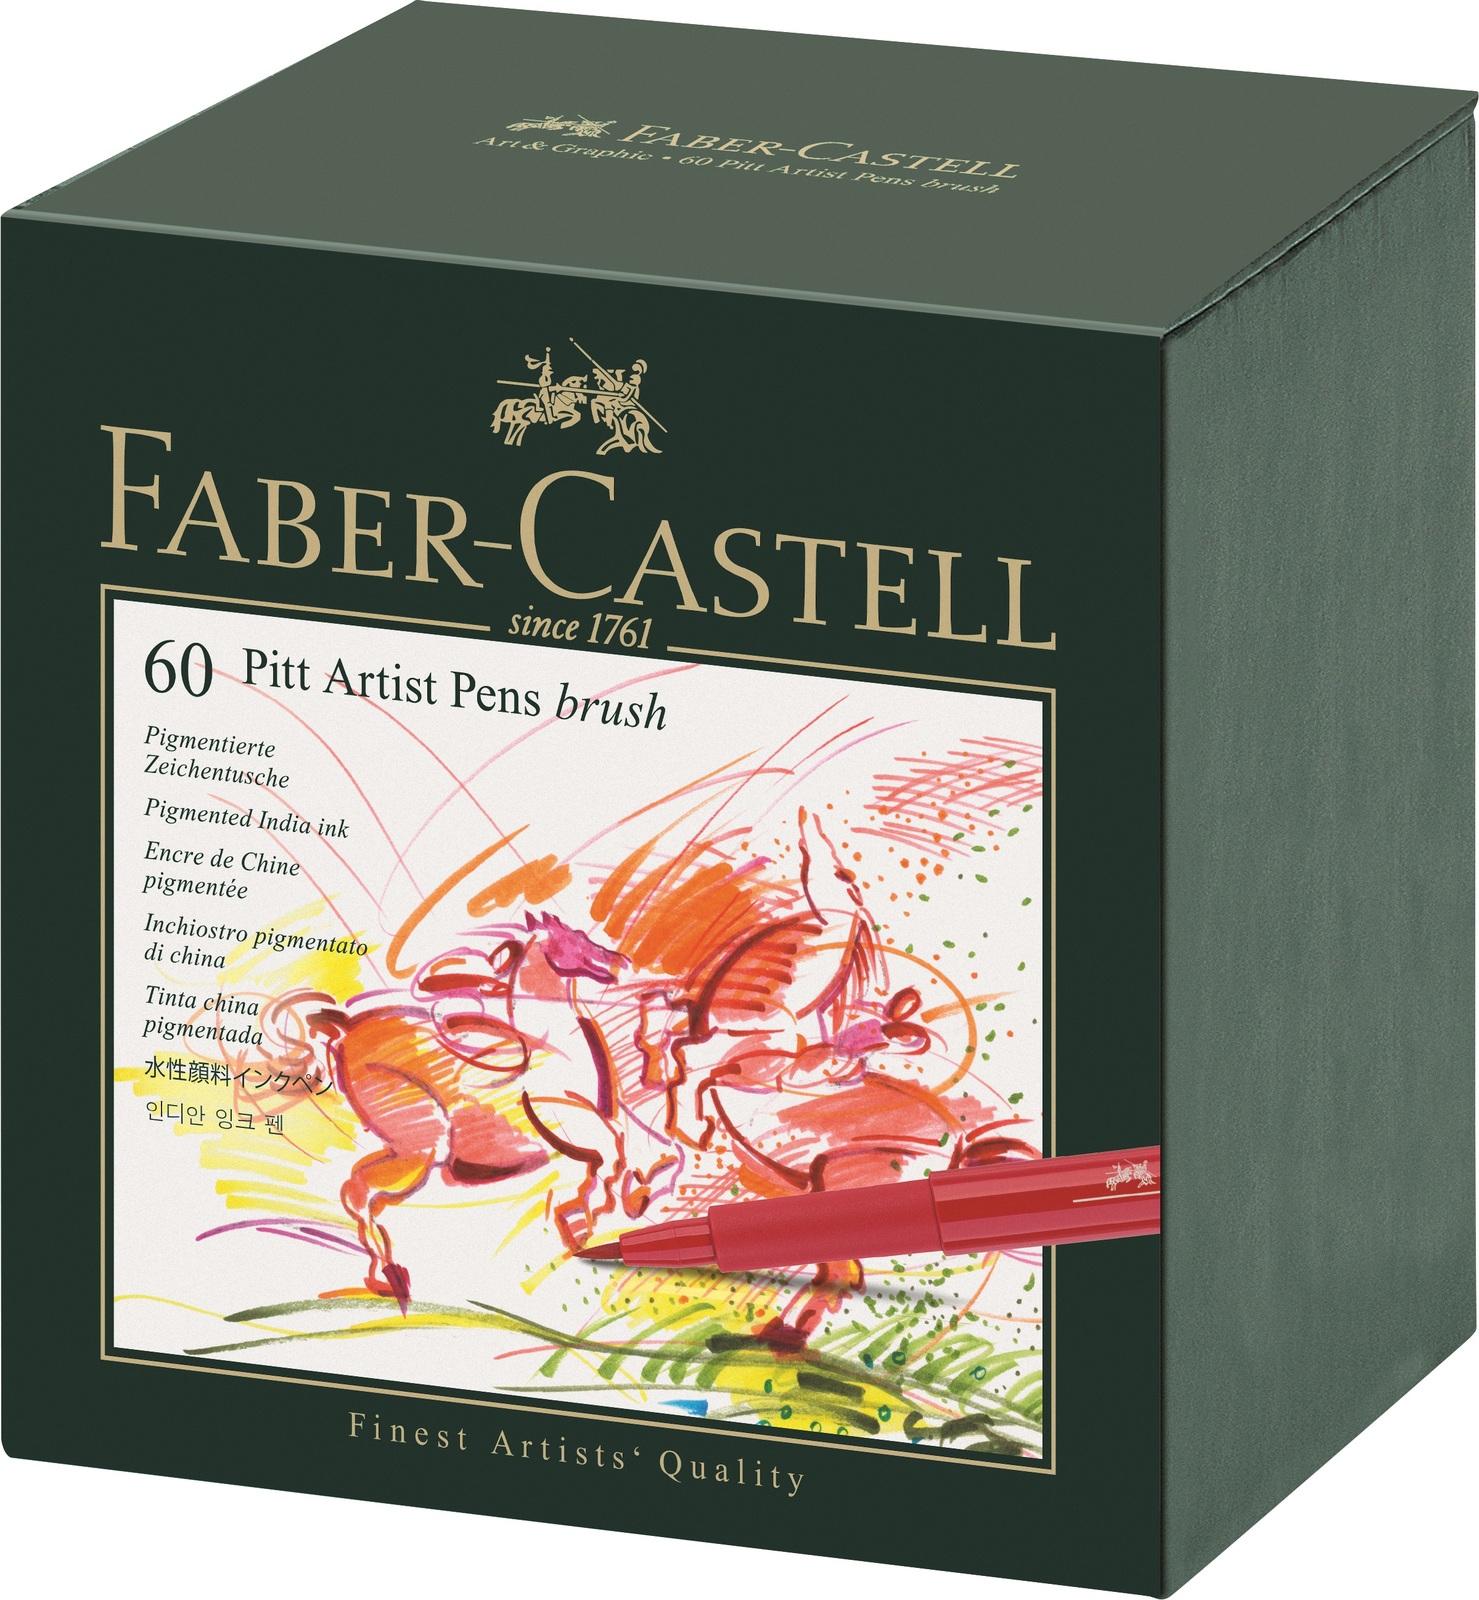 Faber-Castell: Pitt Artist Pens B Studio (Box of 60) image